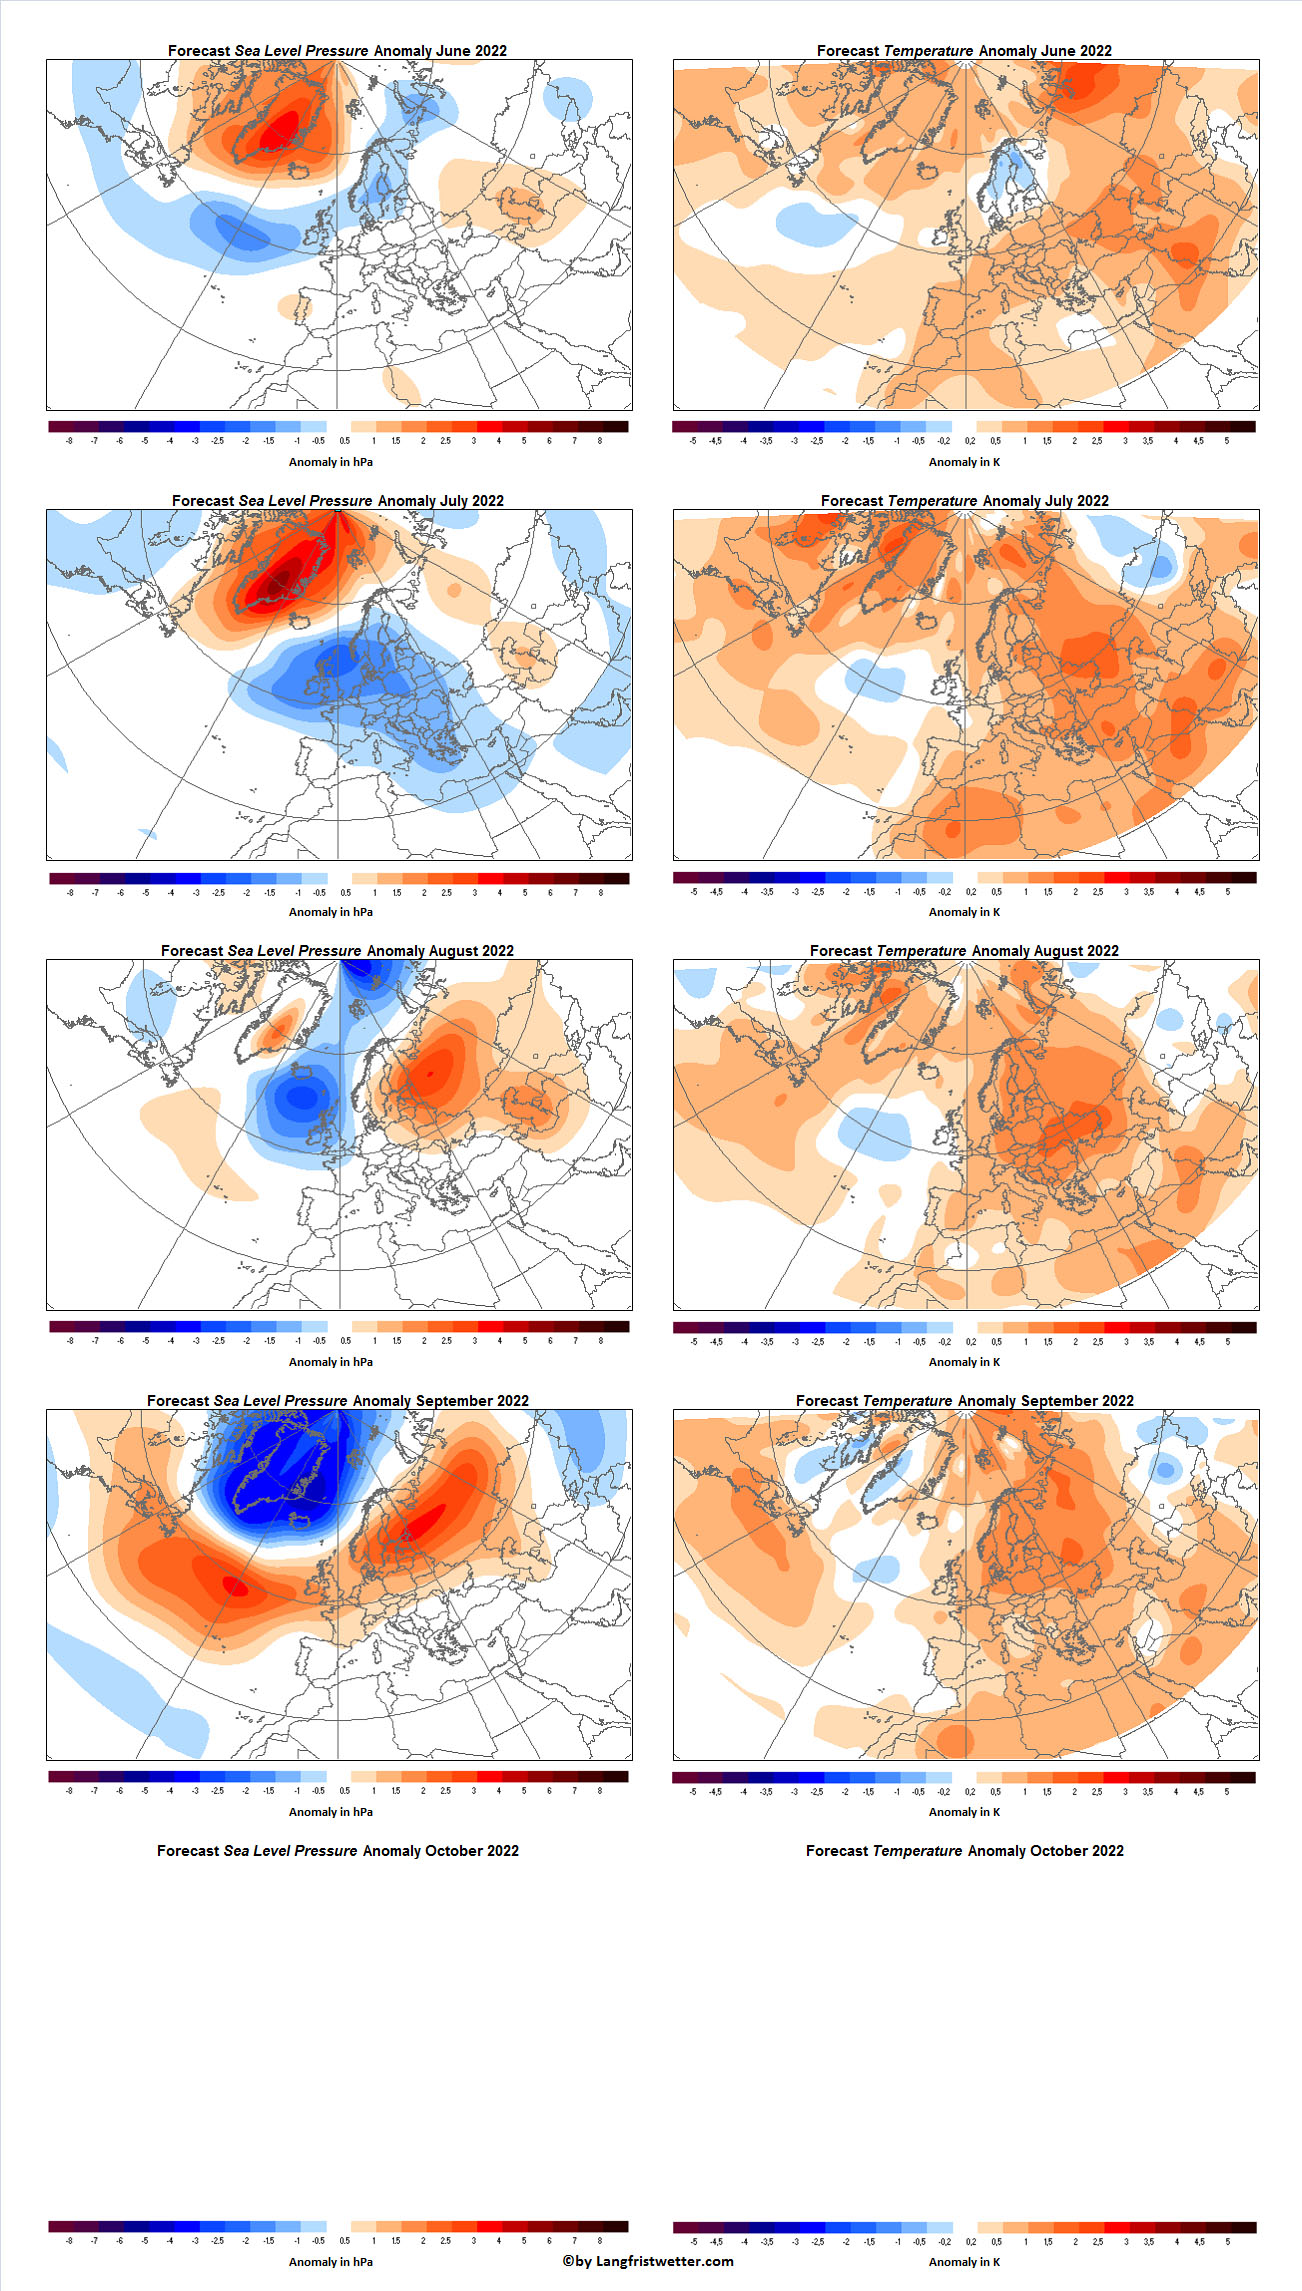 Winterprognose 2018 - Wetter Langfristprognose für